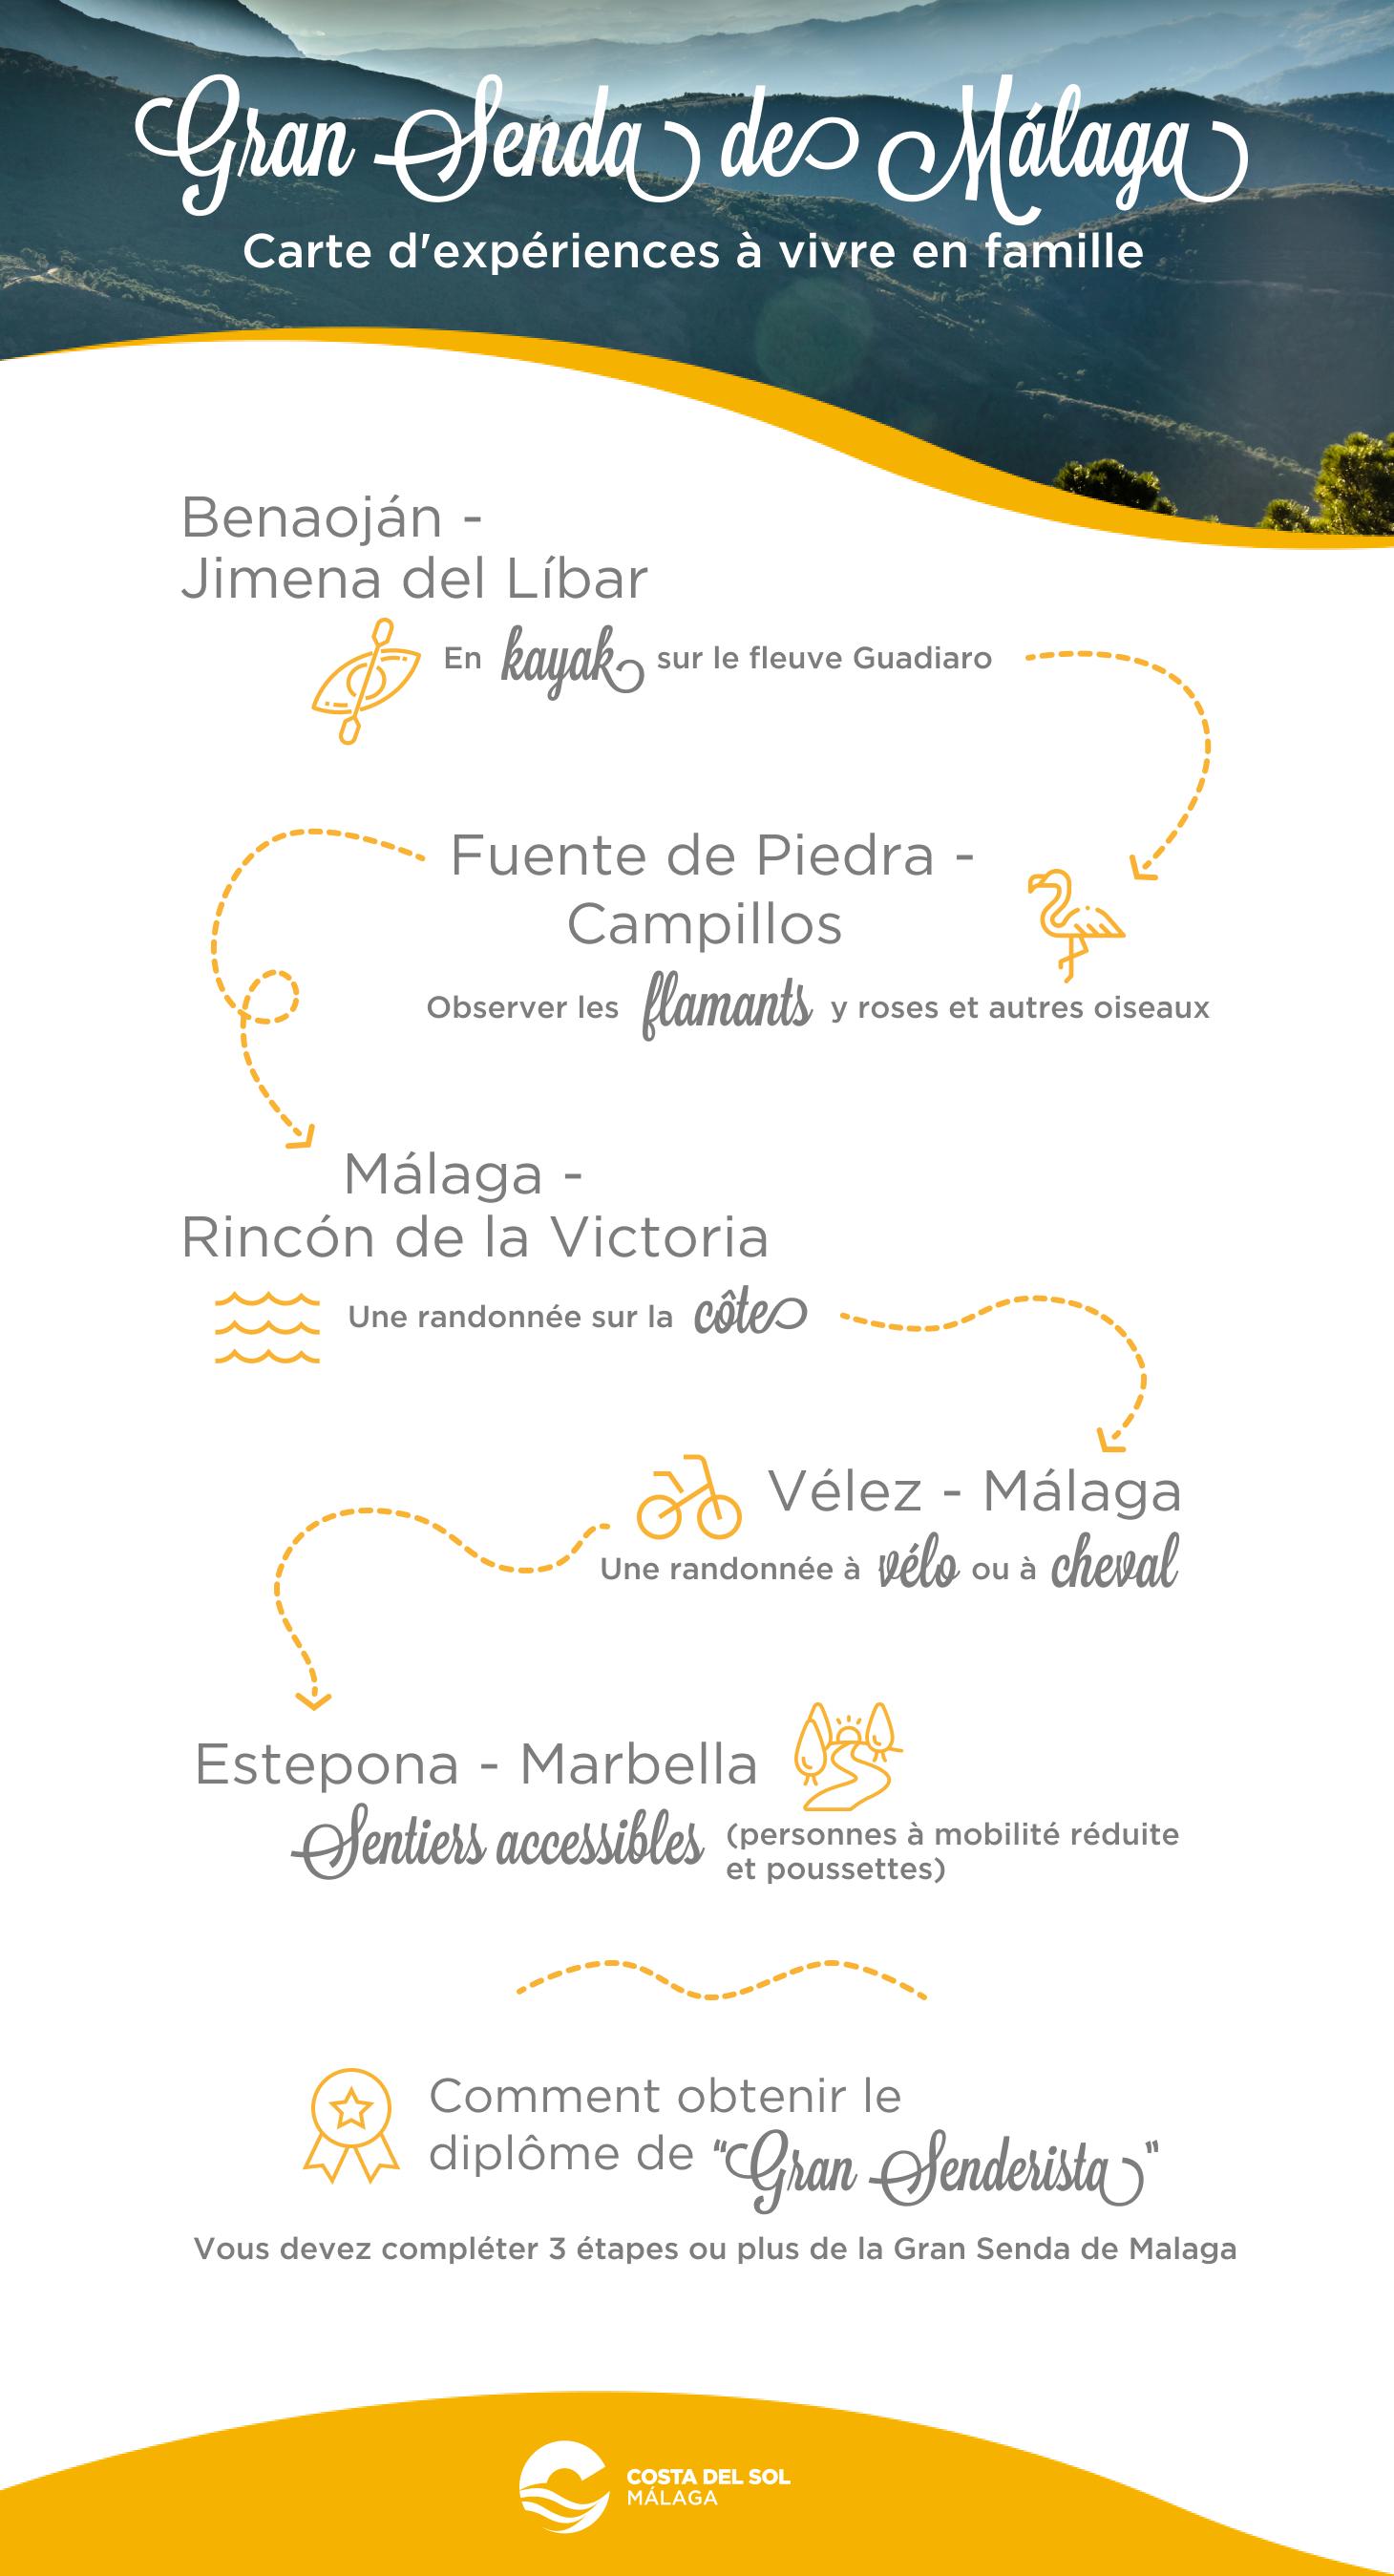 Gran senda Málaga en famille